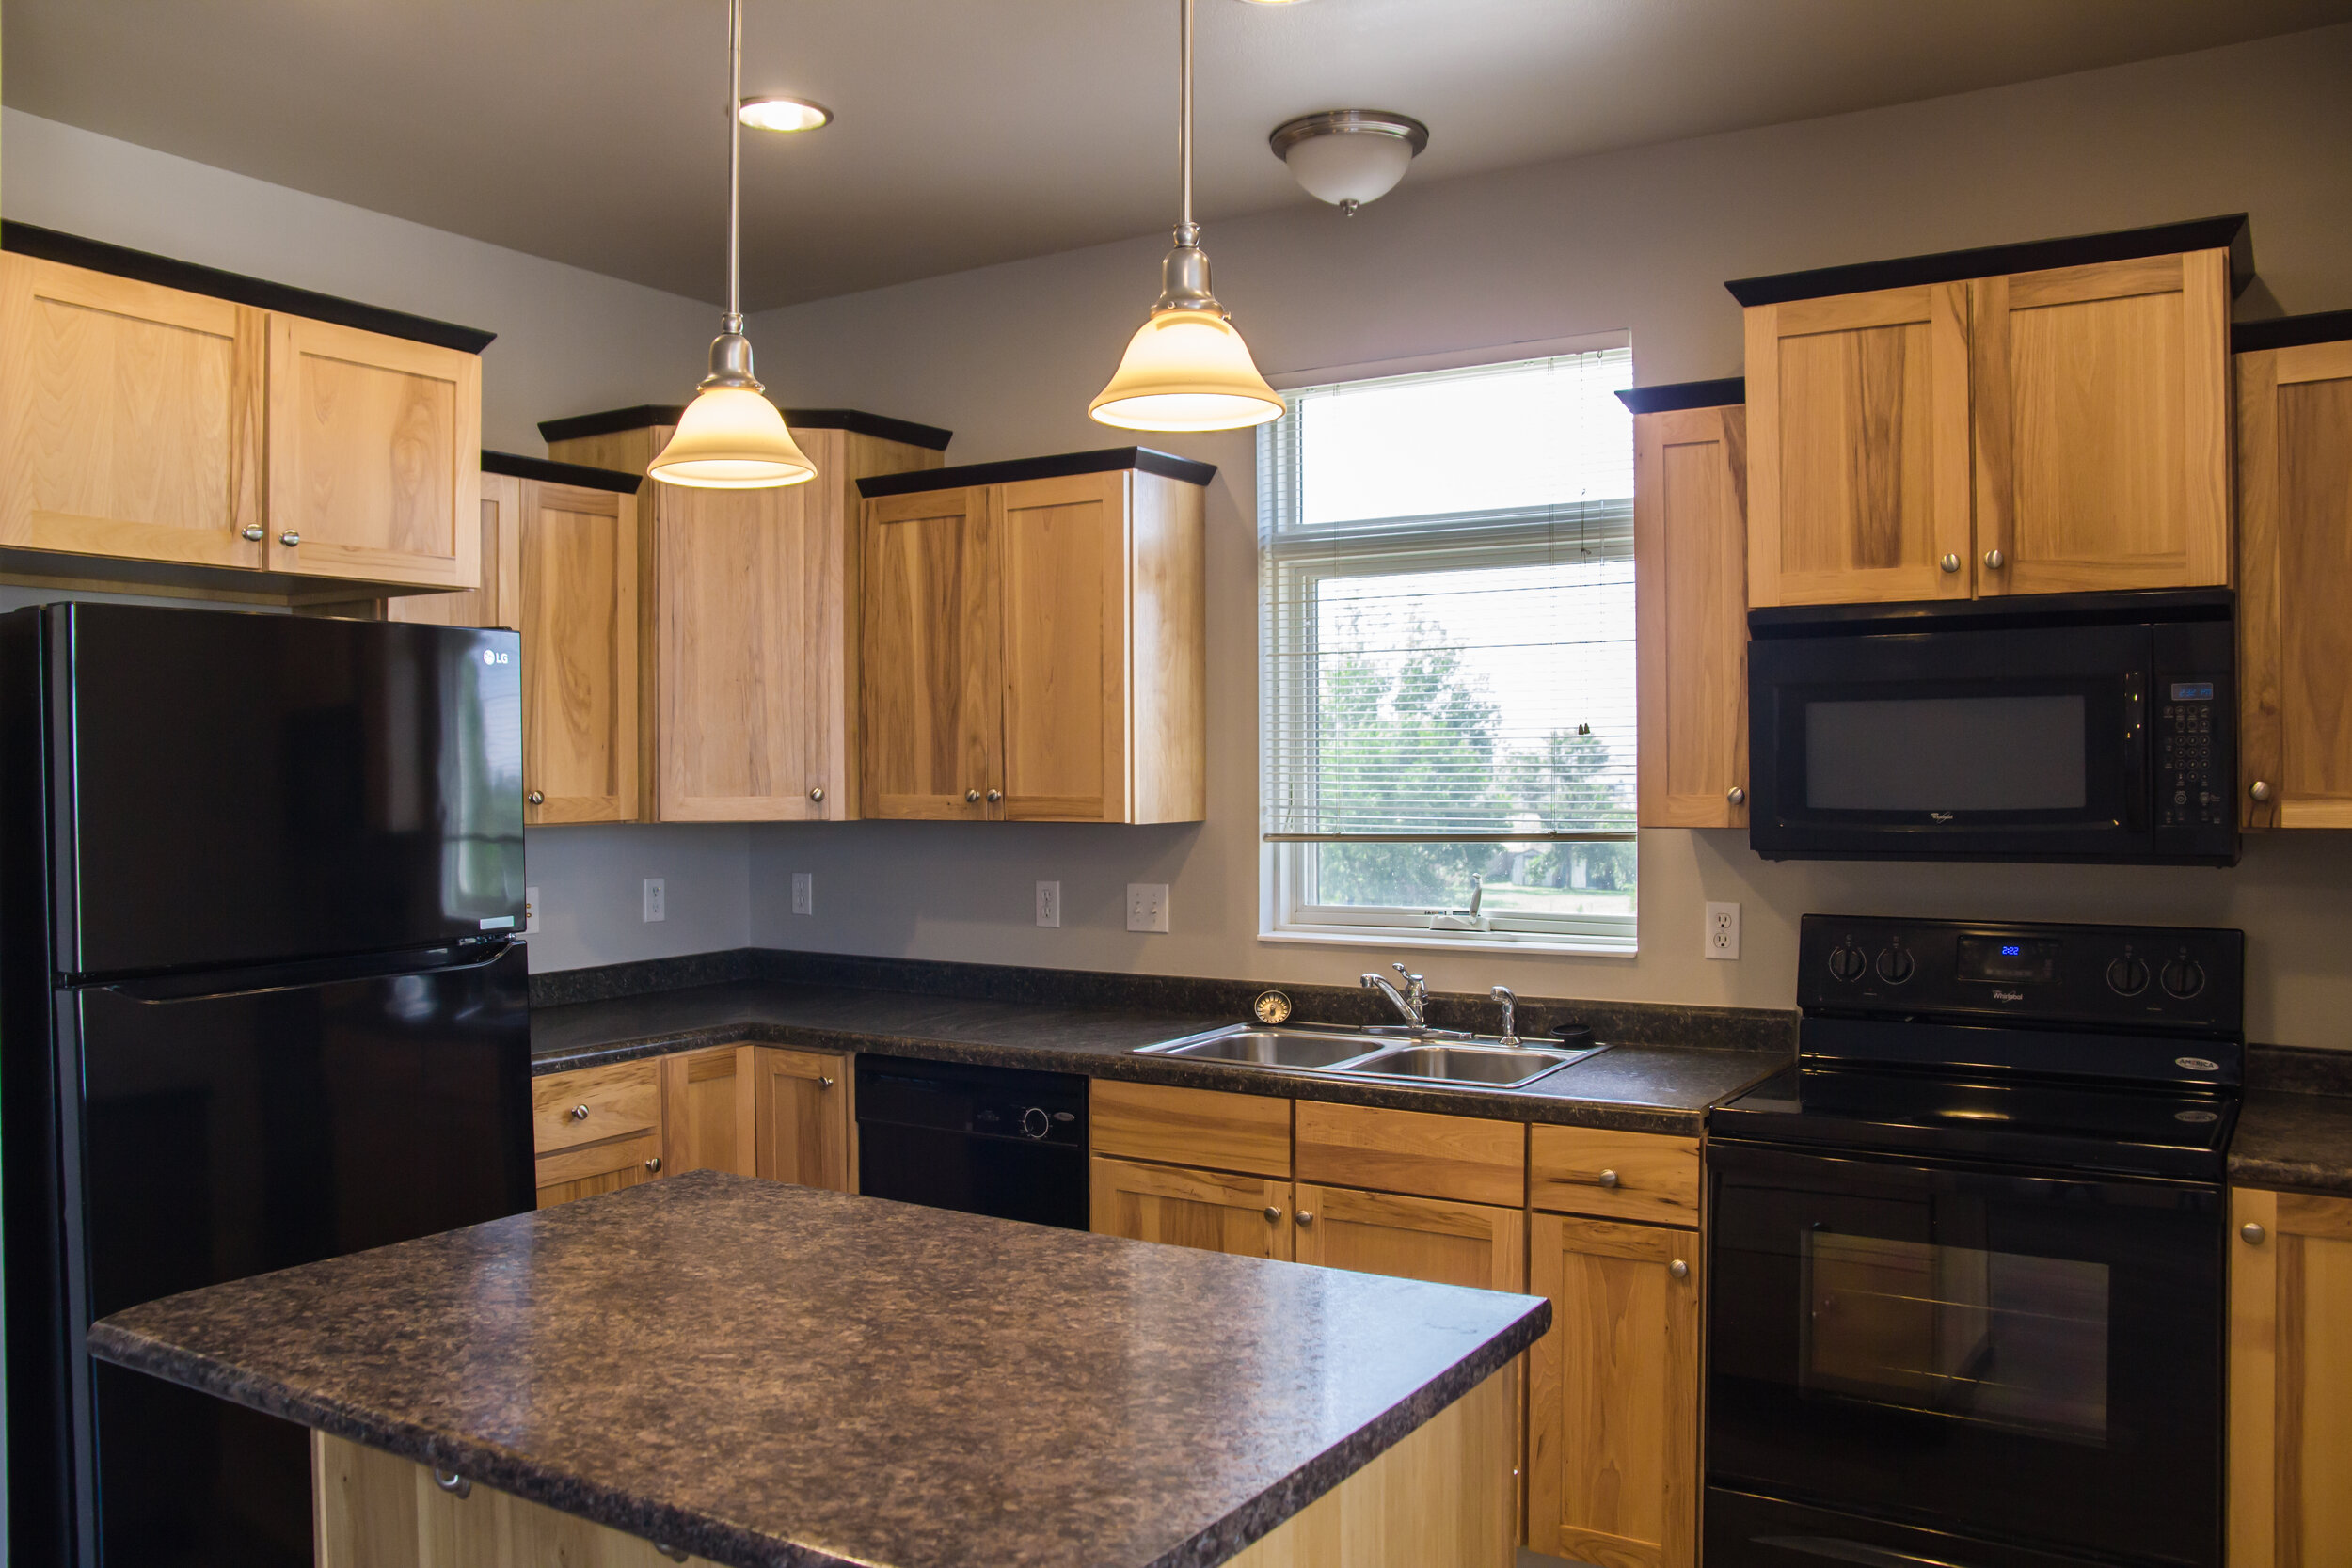 02 Stylish Kitchens with Center Island.jpg